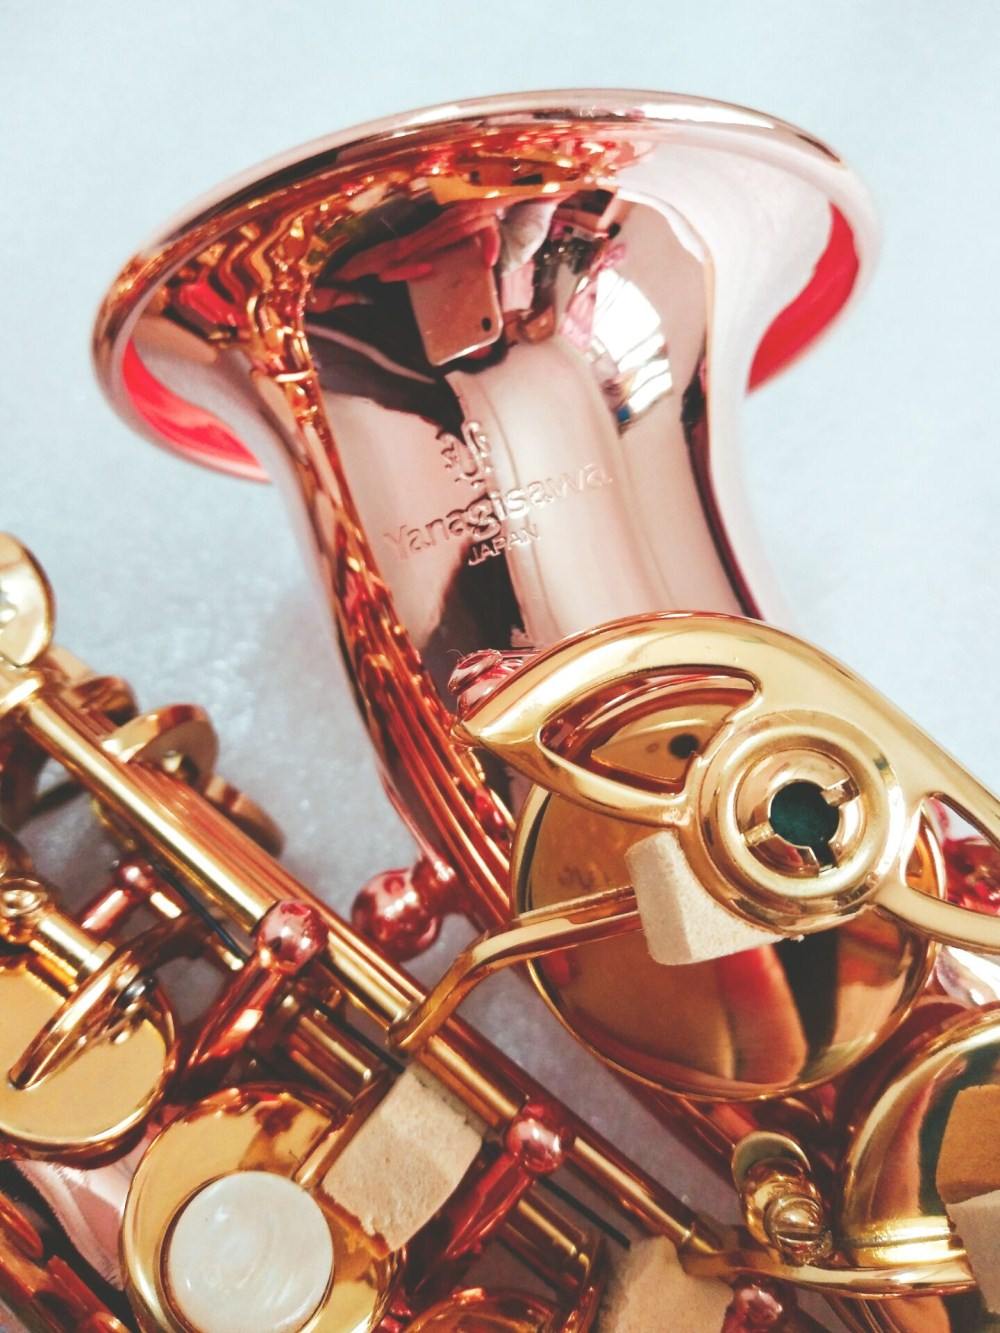 Nuovo Yanagisawa Sassofono Soprano Bb Fosforo Bronzo rame Sax SC-992 Yanagisawa Strumento Musicale Promozioni di Trasporto libero